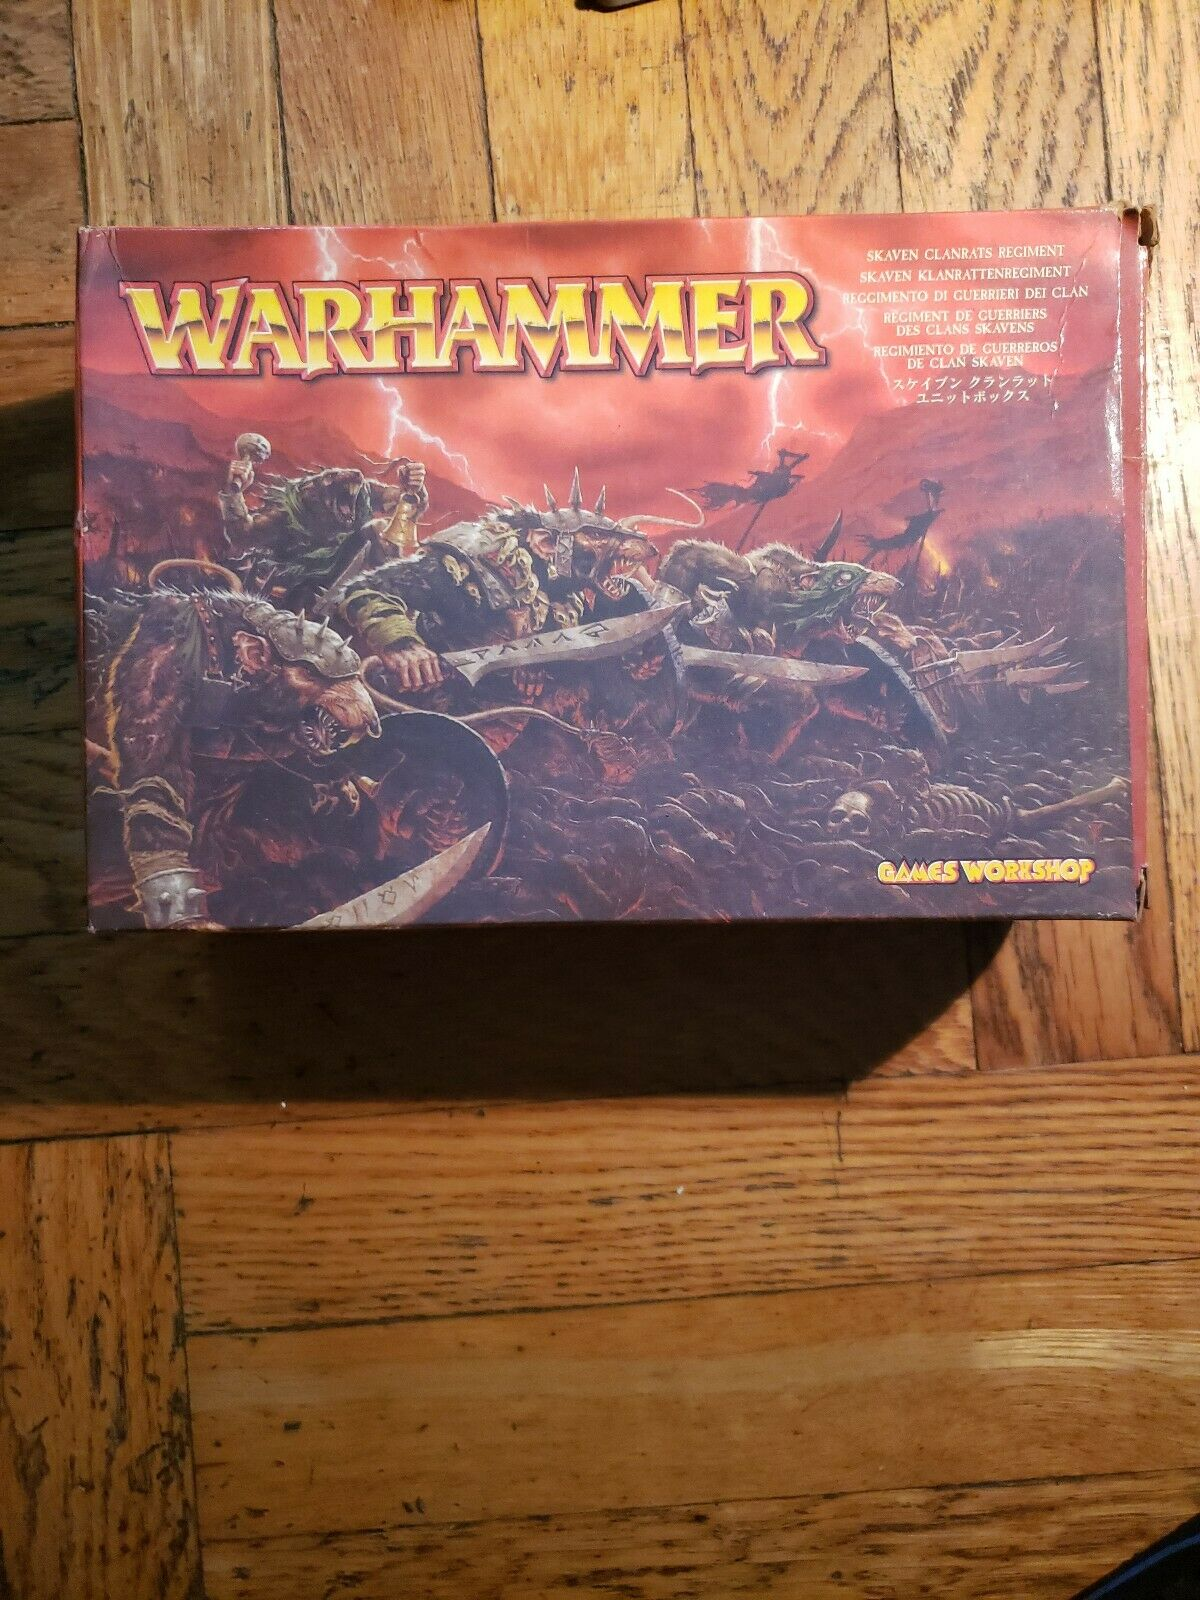 Warhammer SKAVEN CLANRATS Regimiento Juegos Workshop